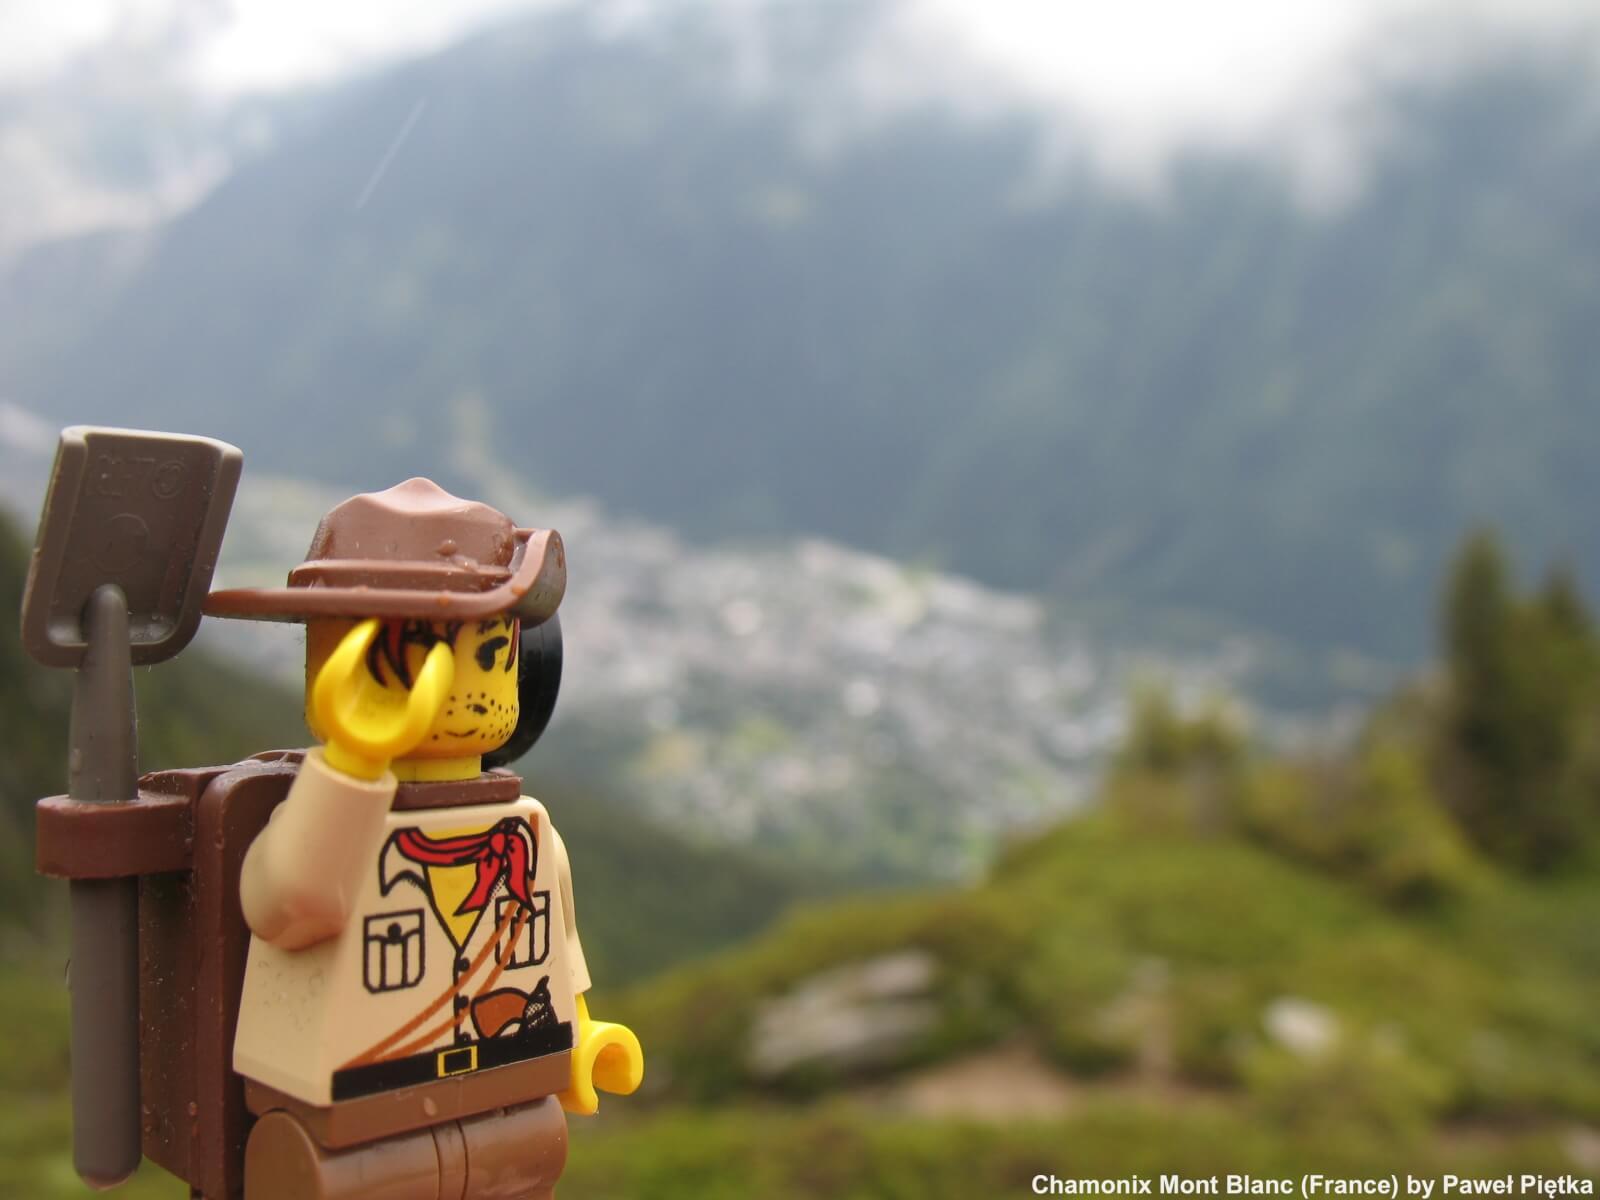 Chamonix Mont Blanc (France) 3